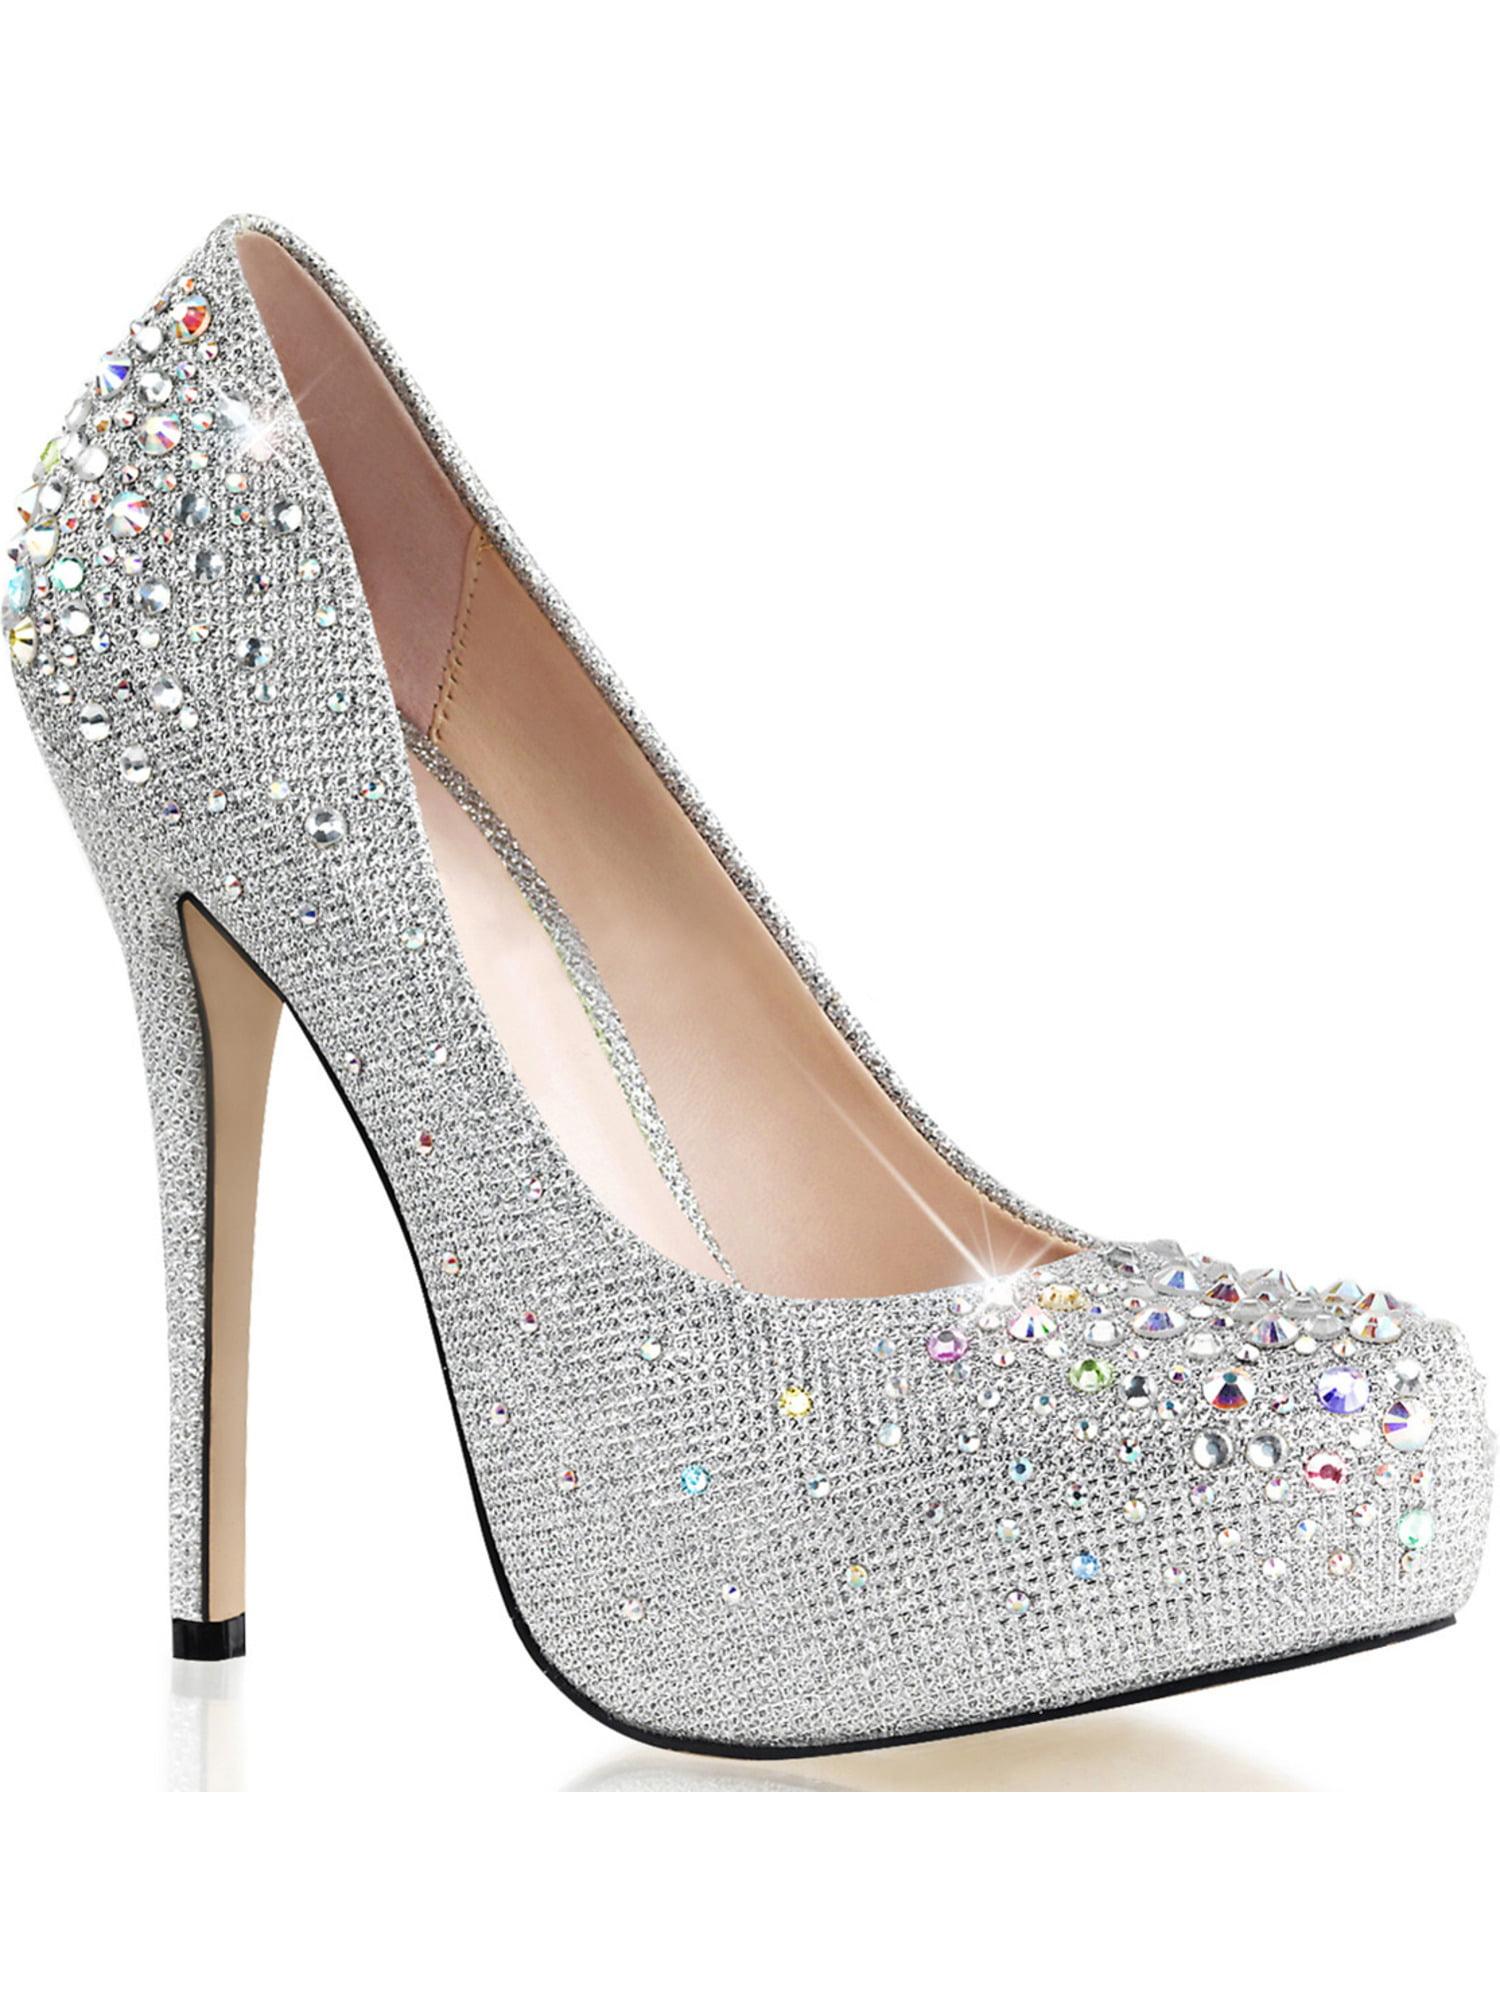 Women Silver Glitter Pumps Shoes